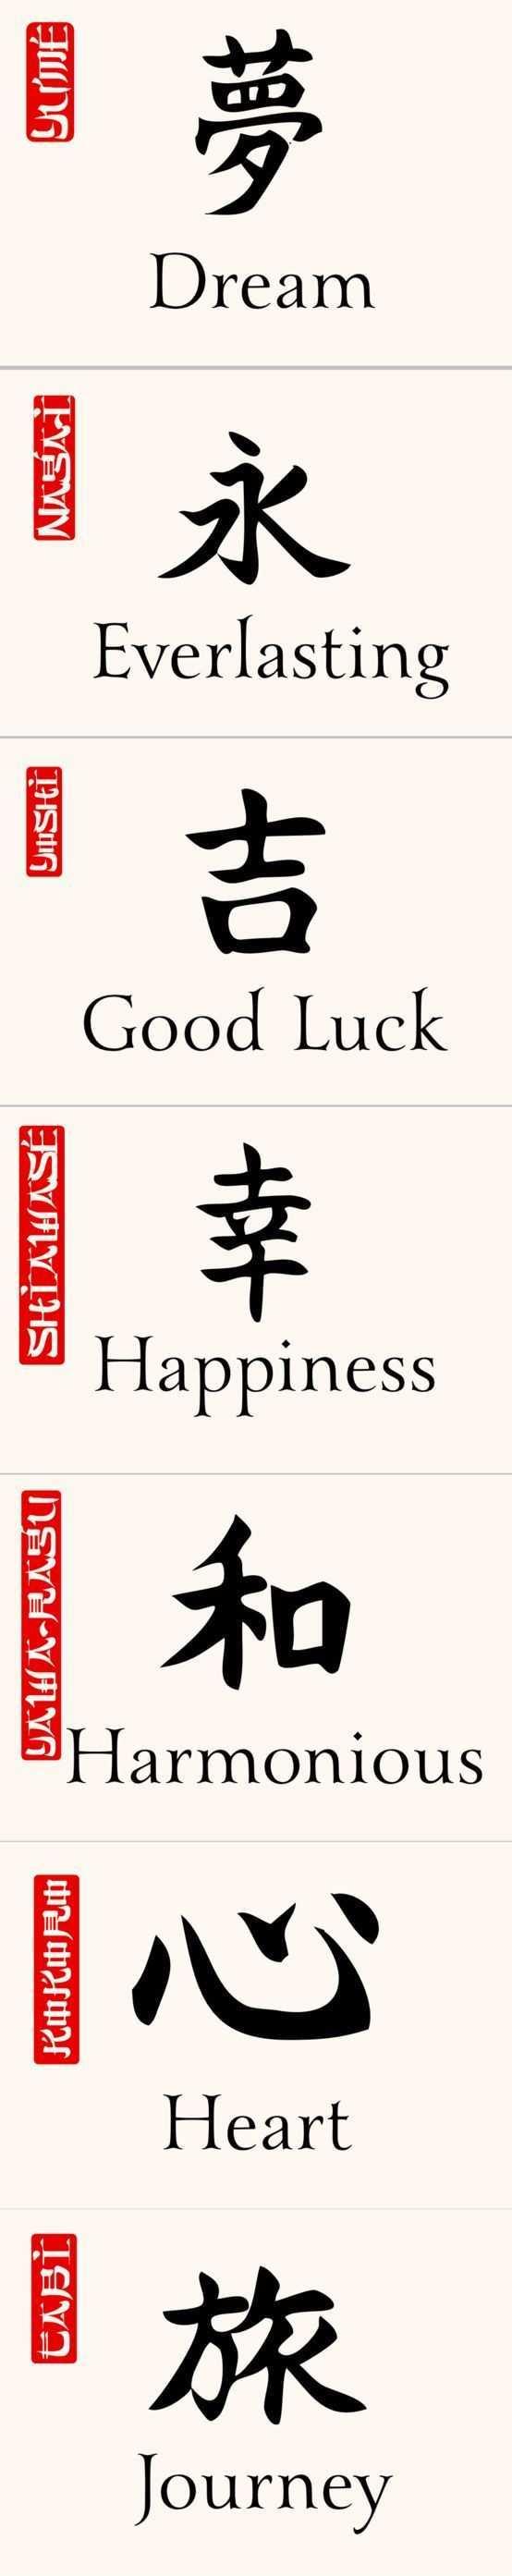 Japanese Tattoo Designs Motifs Symbols And Meanings Japanische Kalligrafie Japanische Kalligraphie Kalligraphie Tattoo